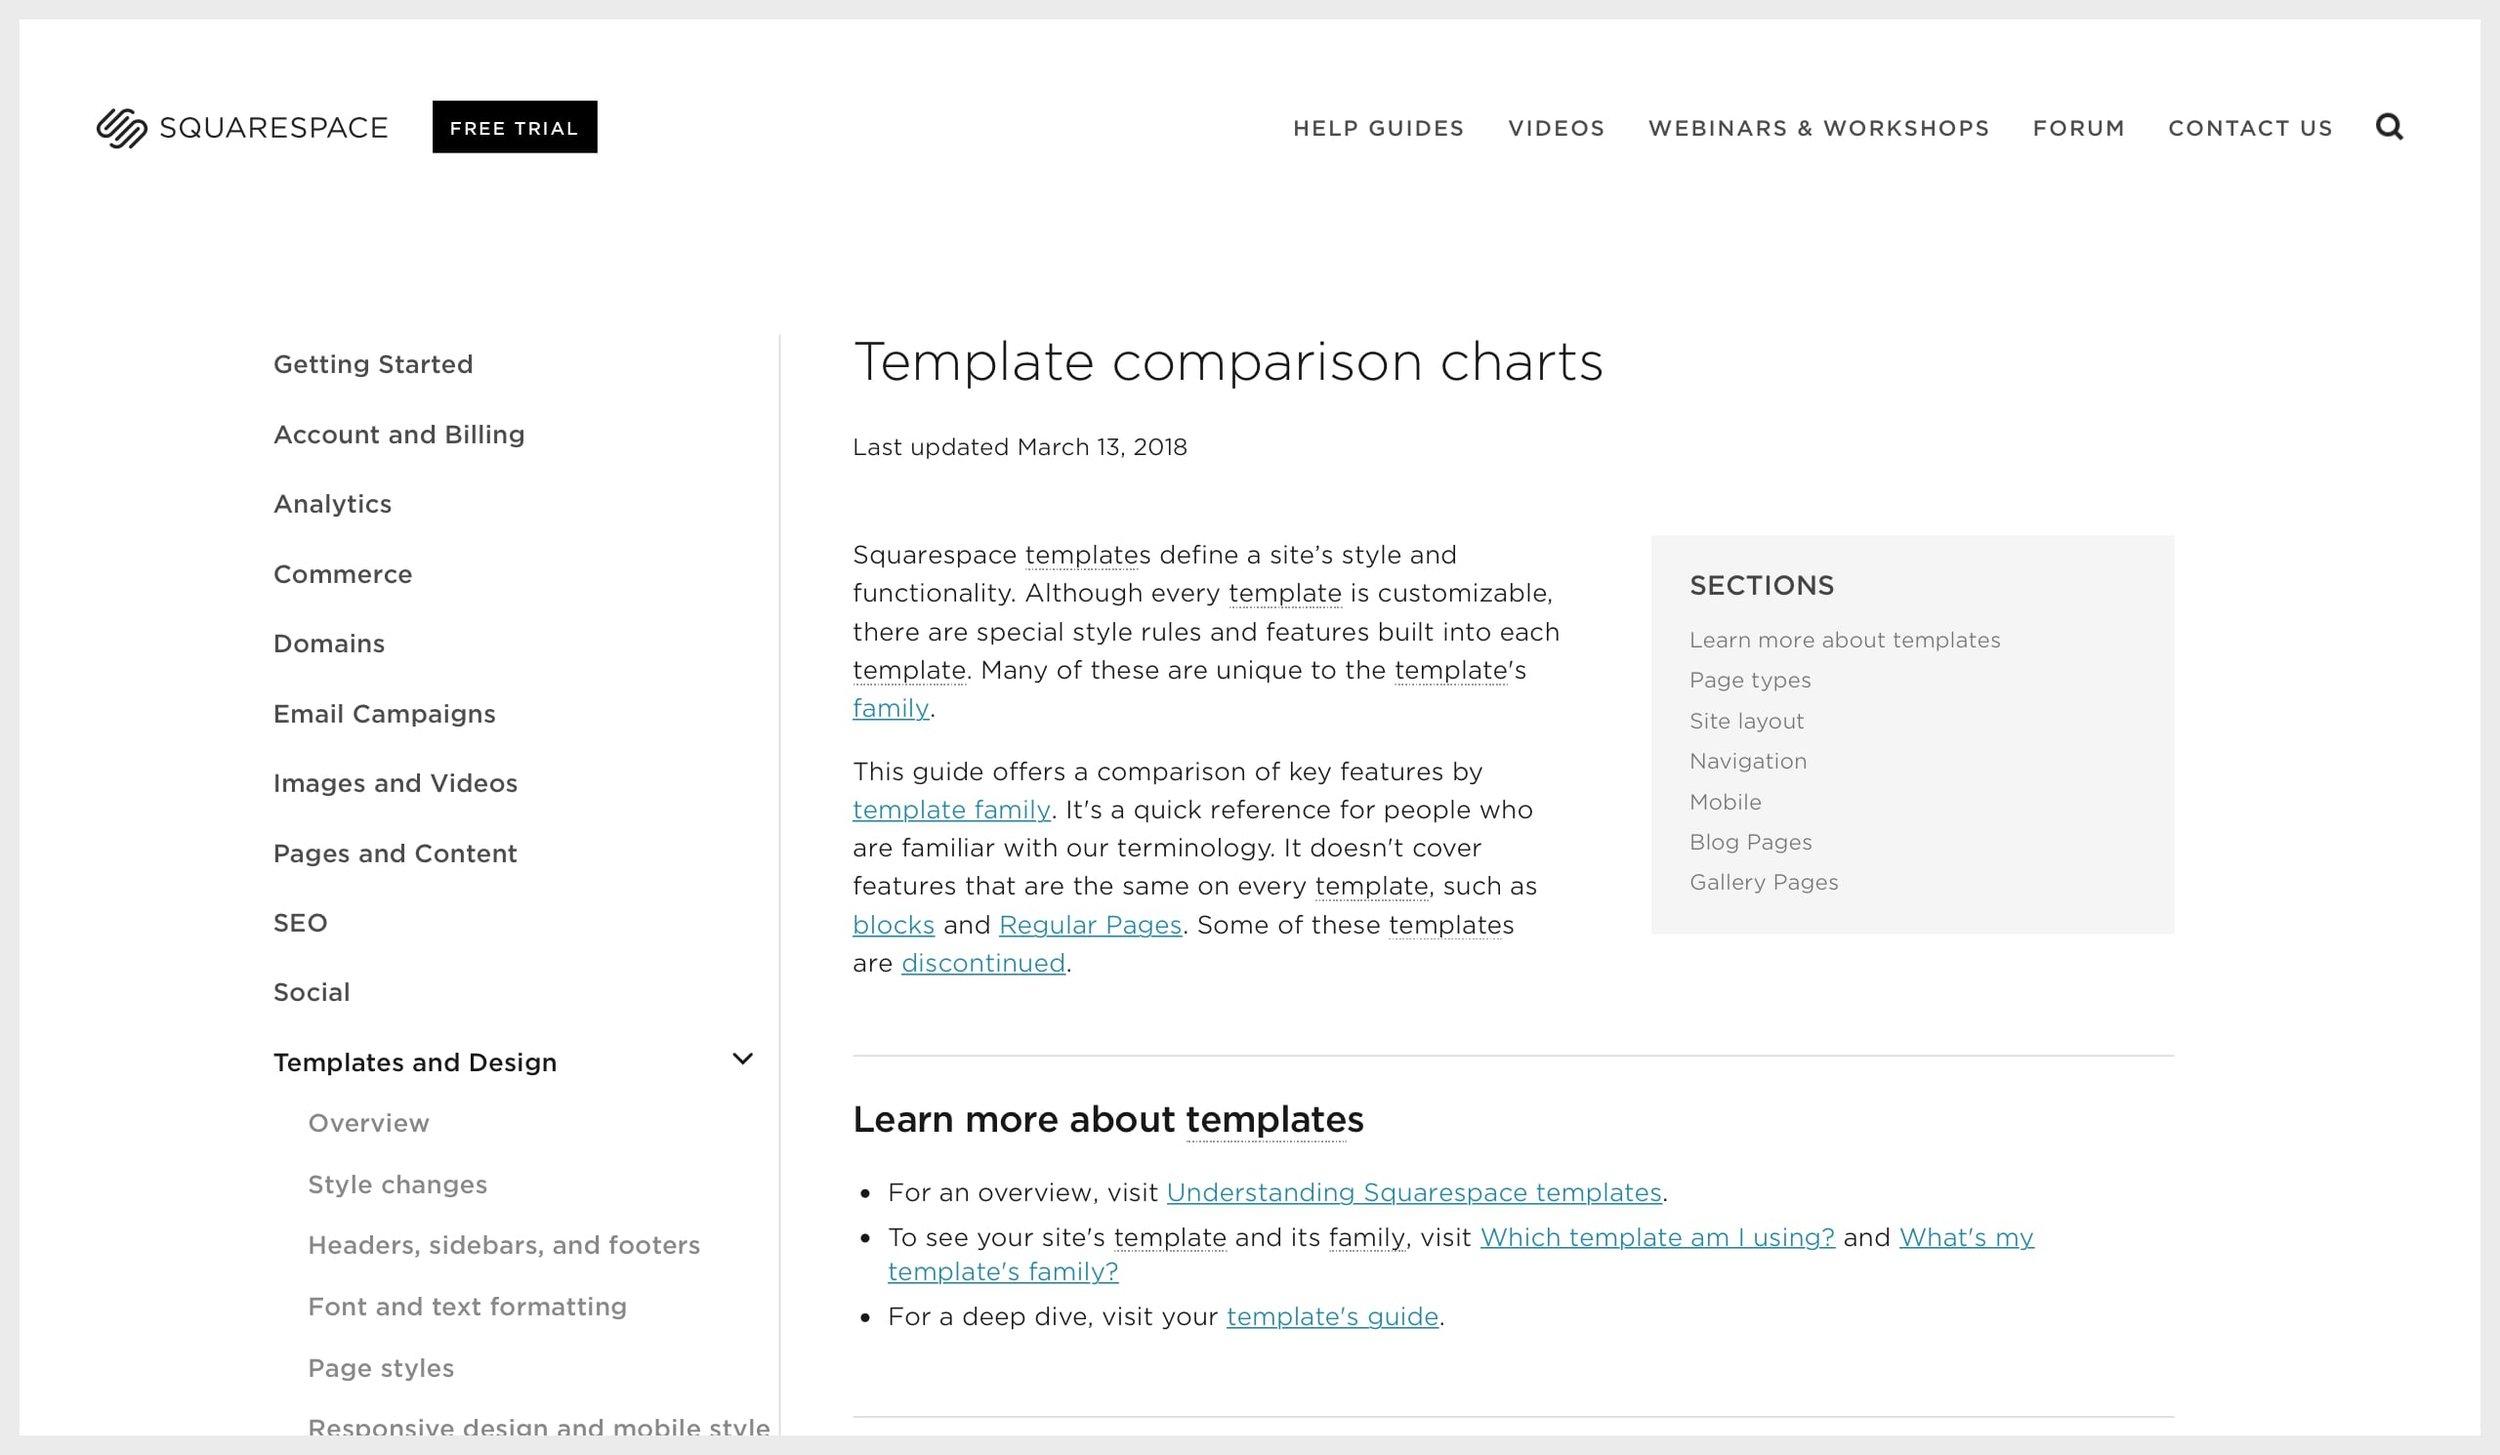 squarespace-template-comparison-charts.jpg